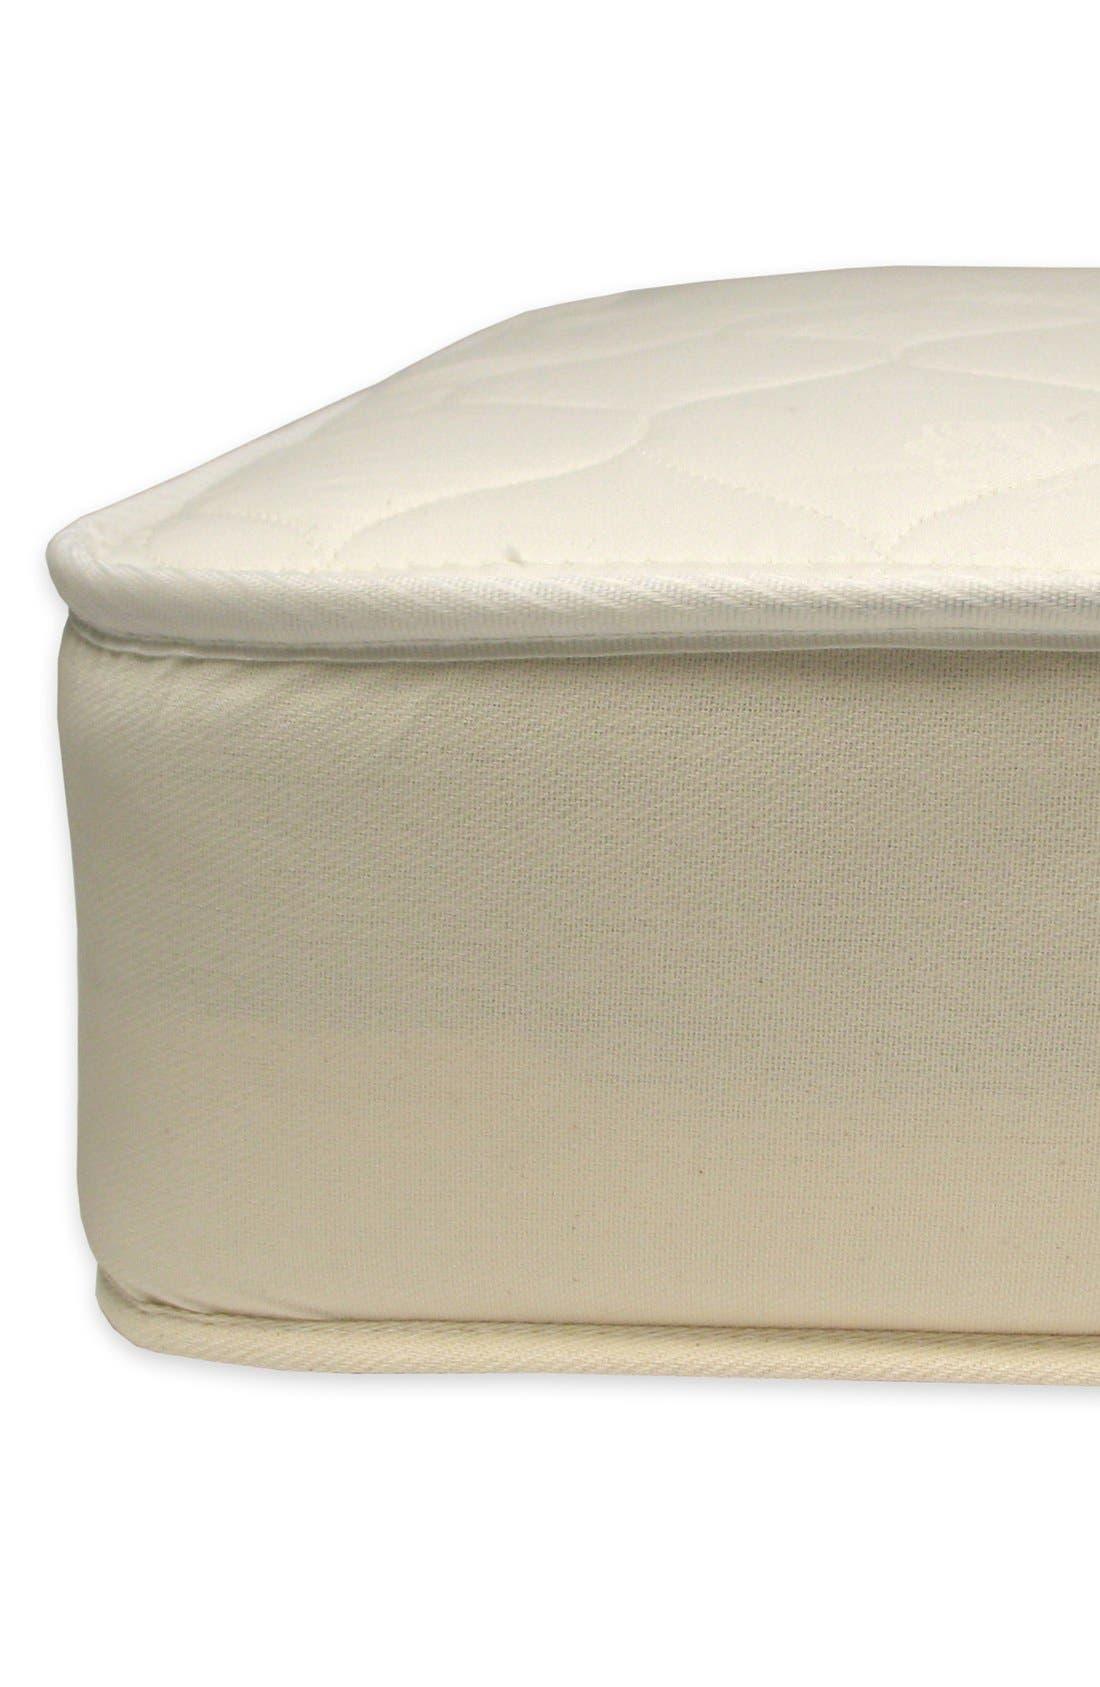 Alternate Image 3  - Naturepedic '252' Organic Cotton 2-in-1 Ultra/Quilted Crib Mattress